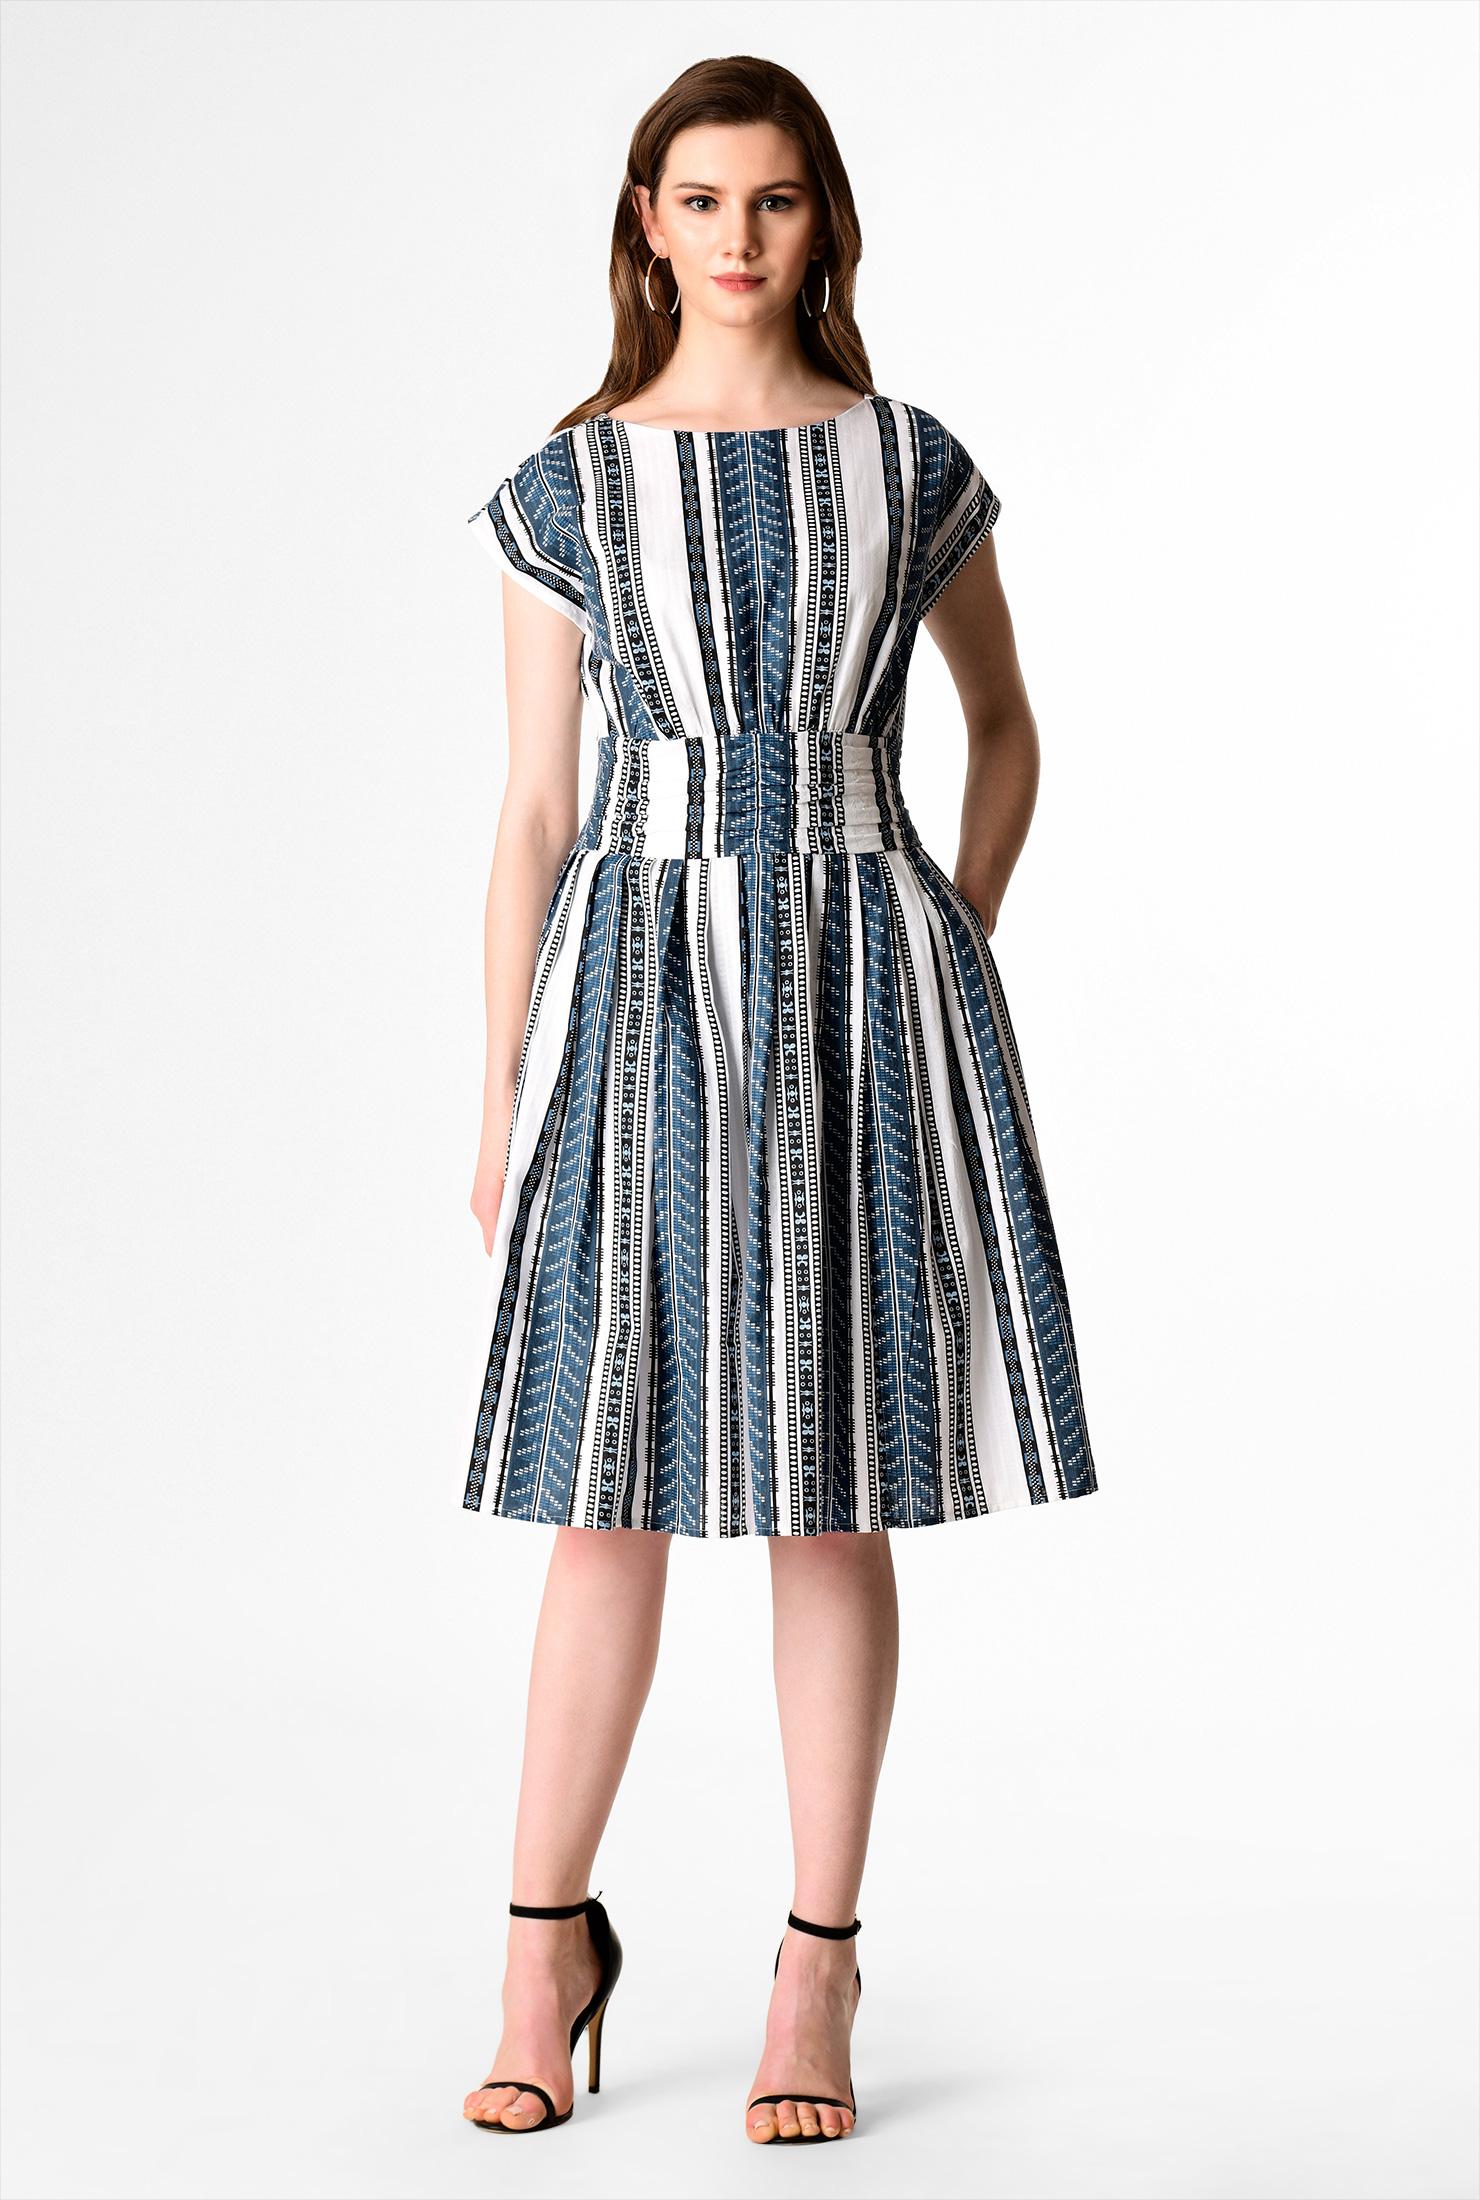 aa37ef206a8 Women s Fashion Clothing 0-36W and Custom